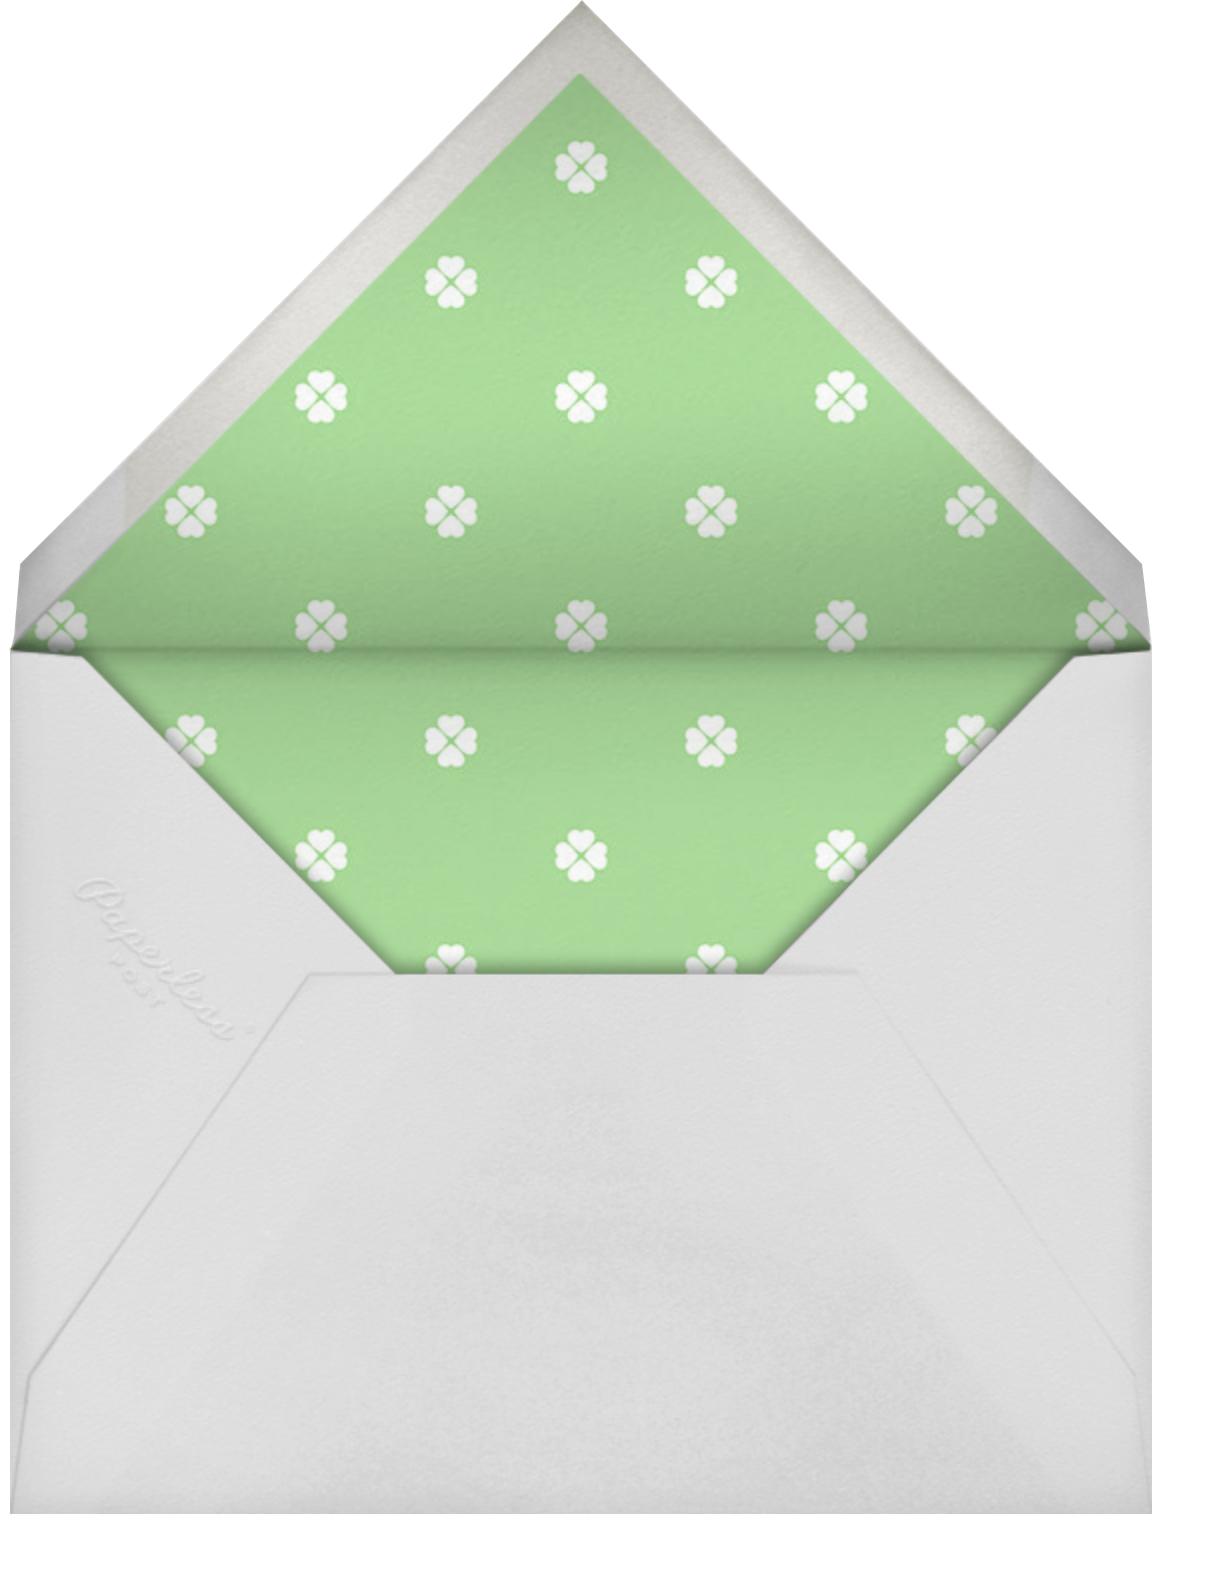 Colorblocked Stripes - Lemon Drop/Meadow - kate spade new york - General entertaining - envelope back